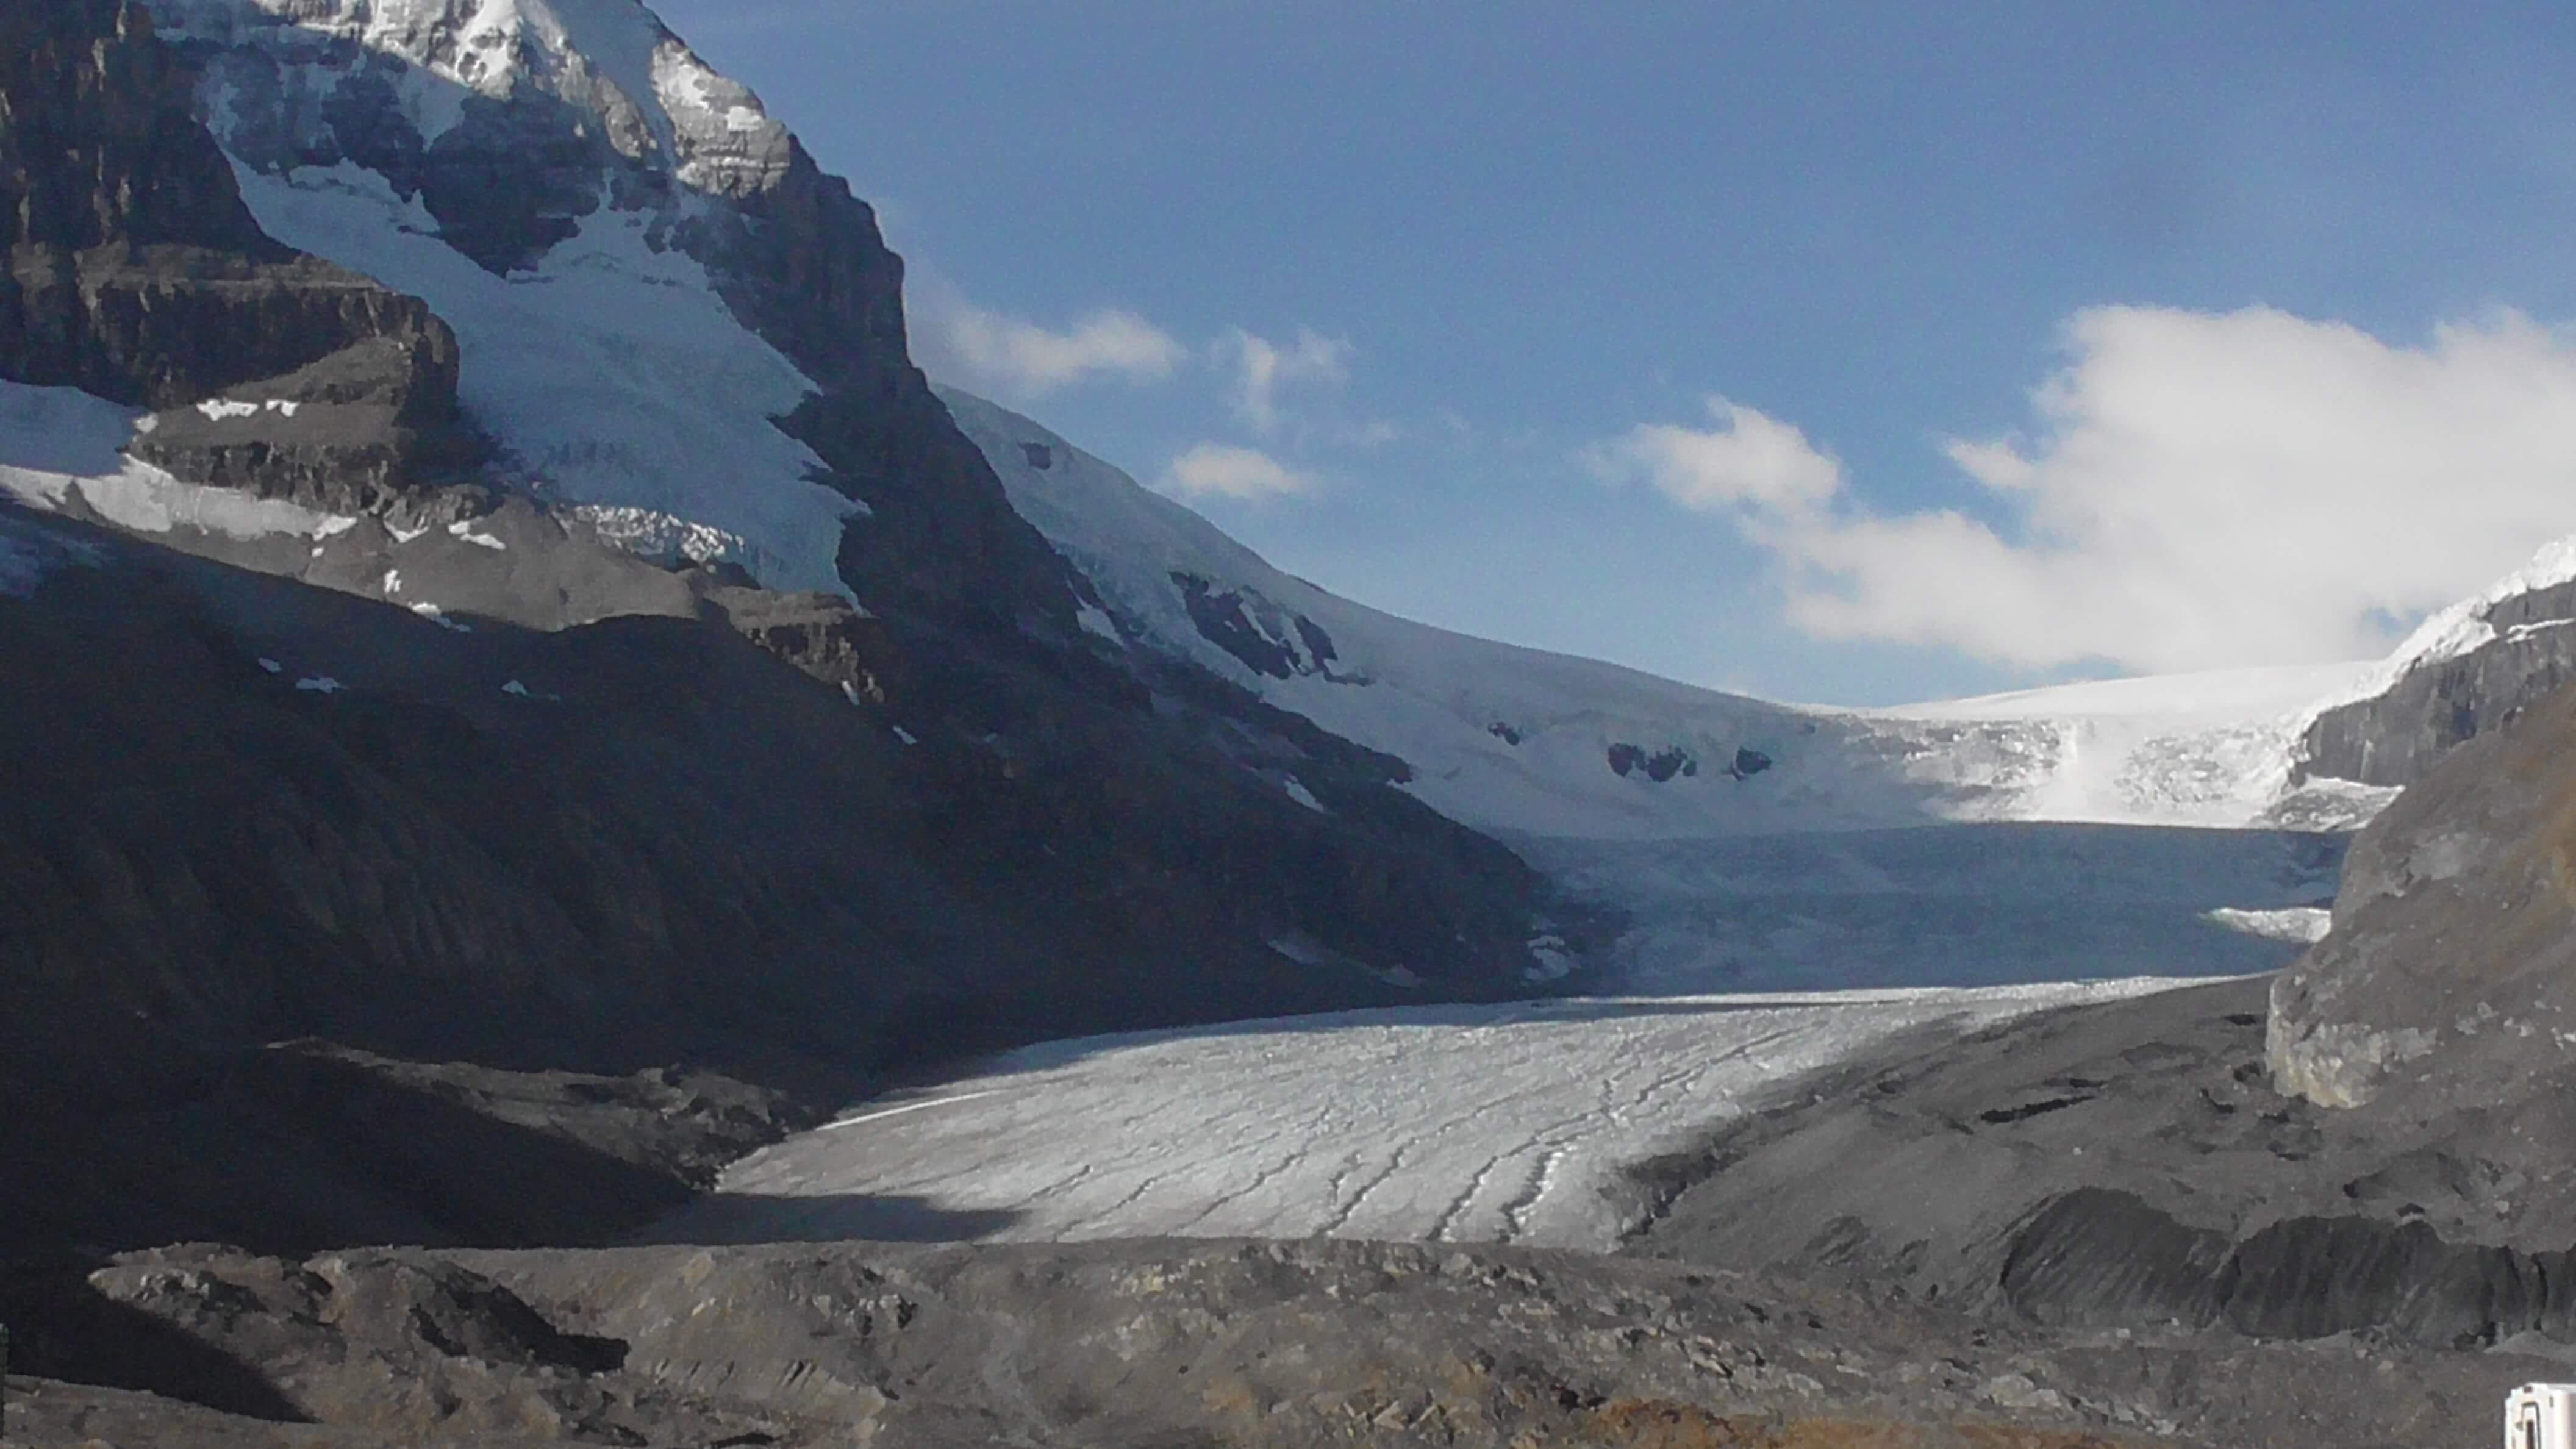 Athabasca Glacier, Jasper National Park, Alberta